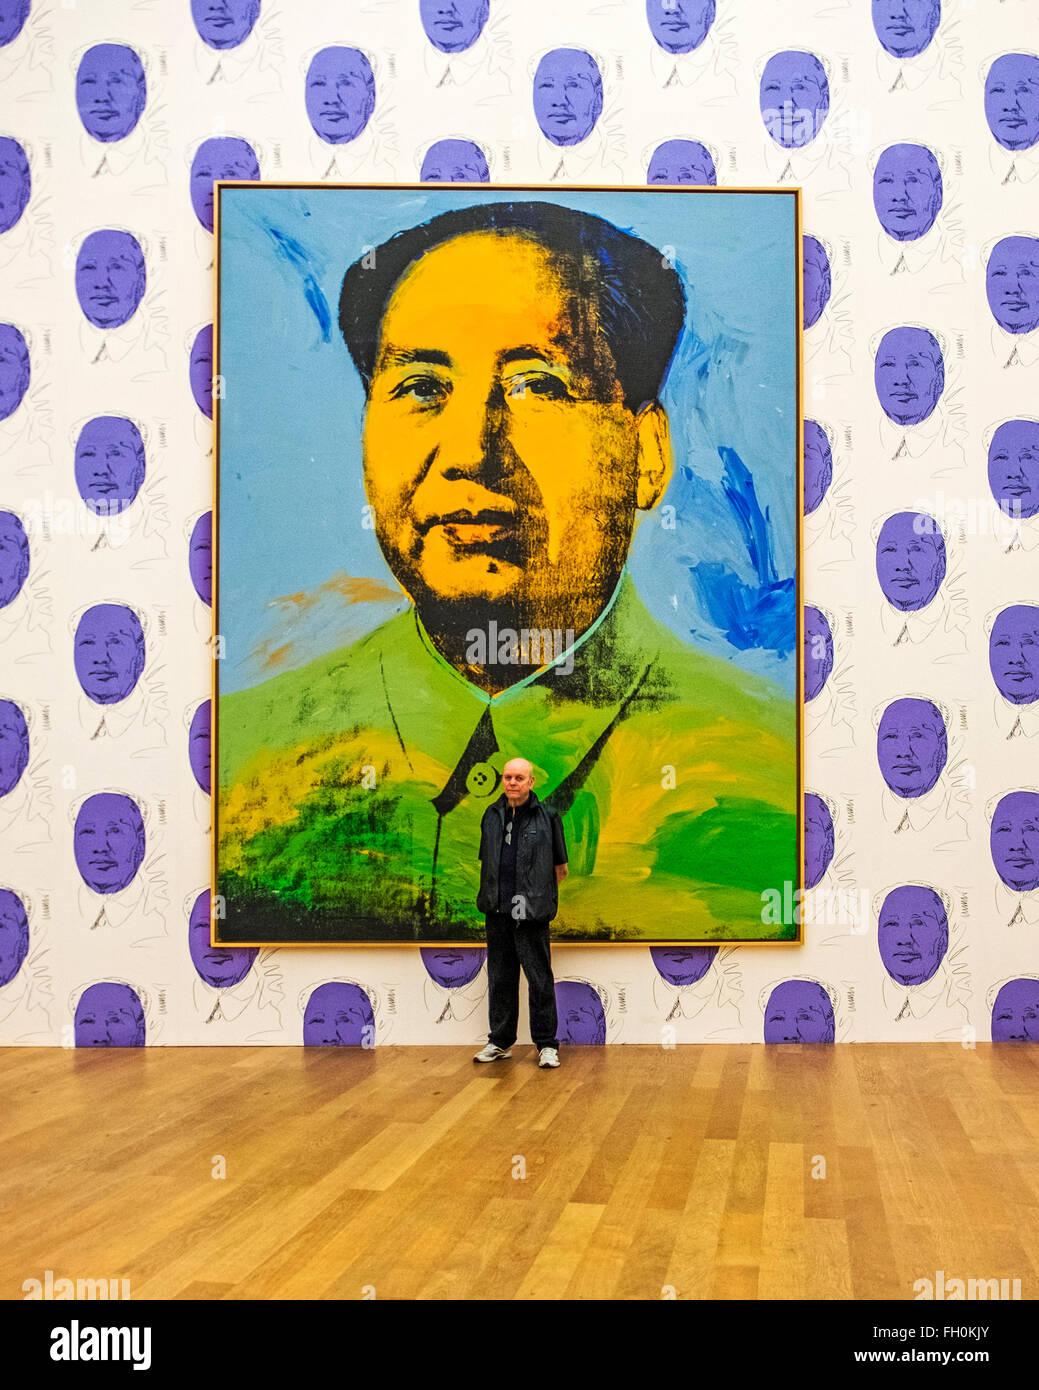 Andy Warhol Kunstwerke Mao Tse Tung In Das Hamburger Bahnhof